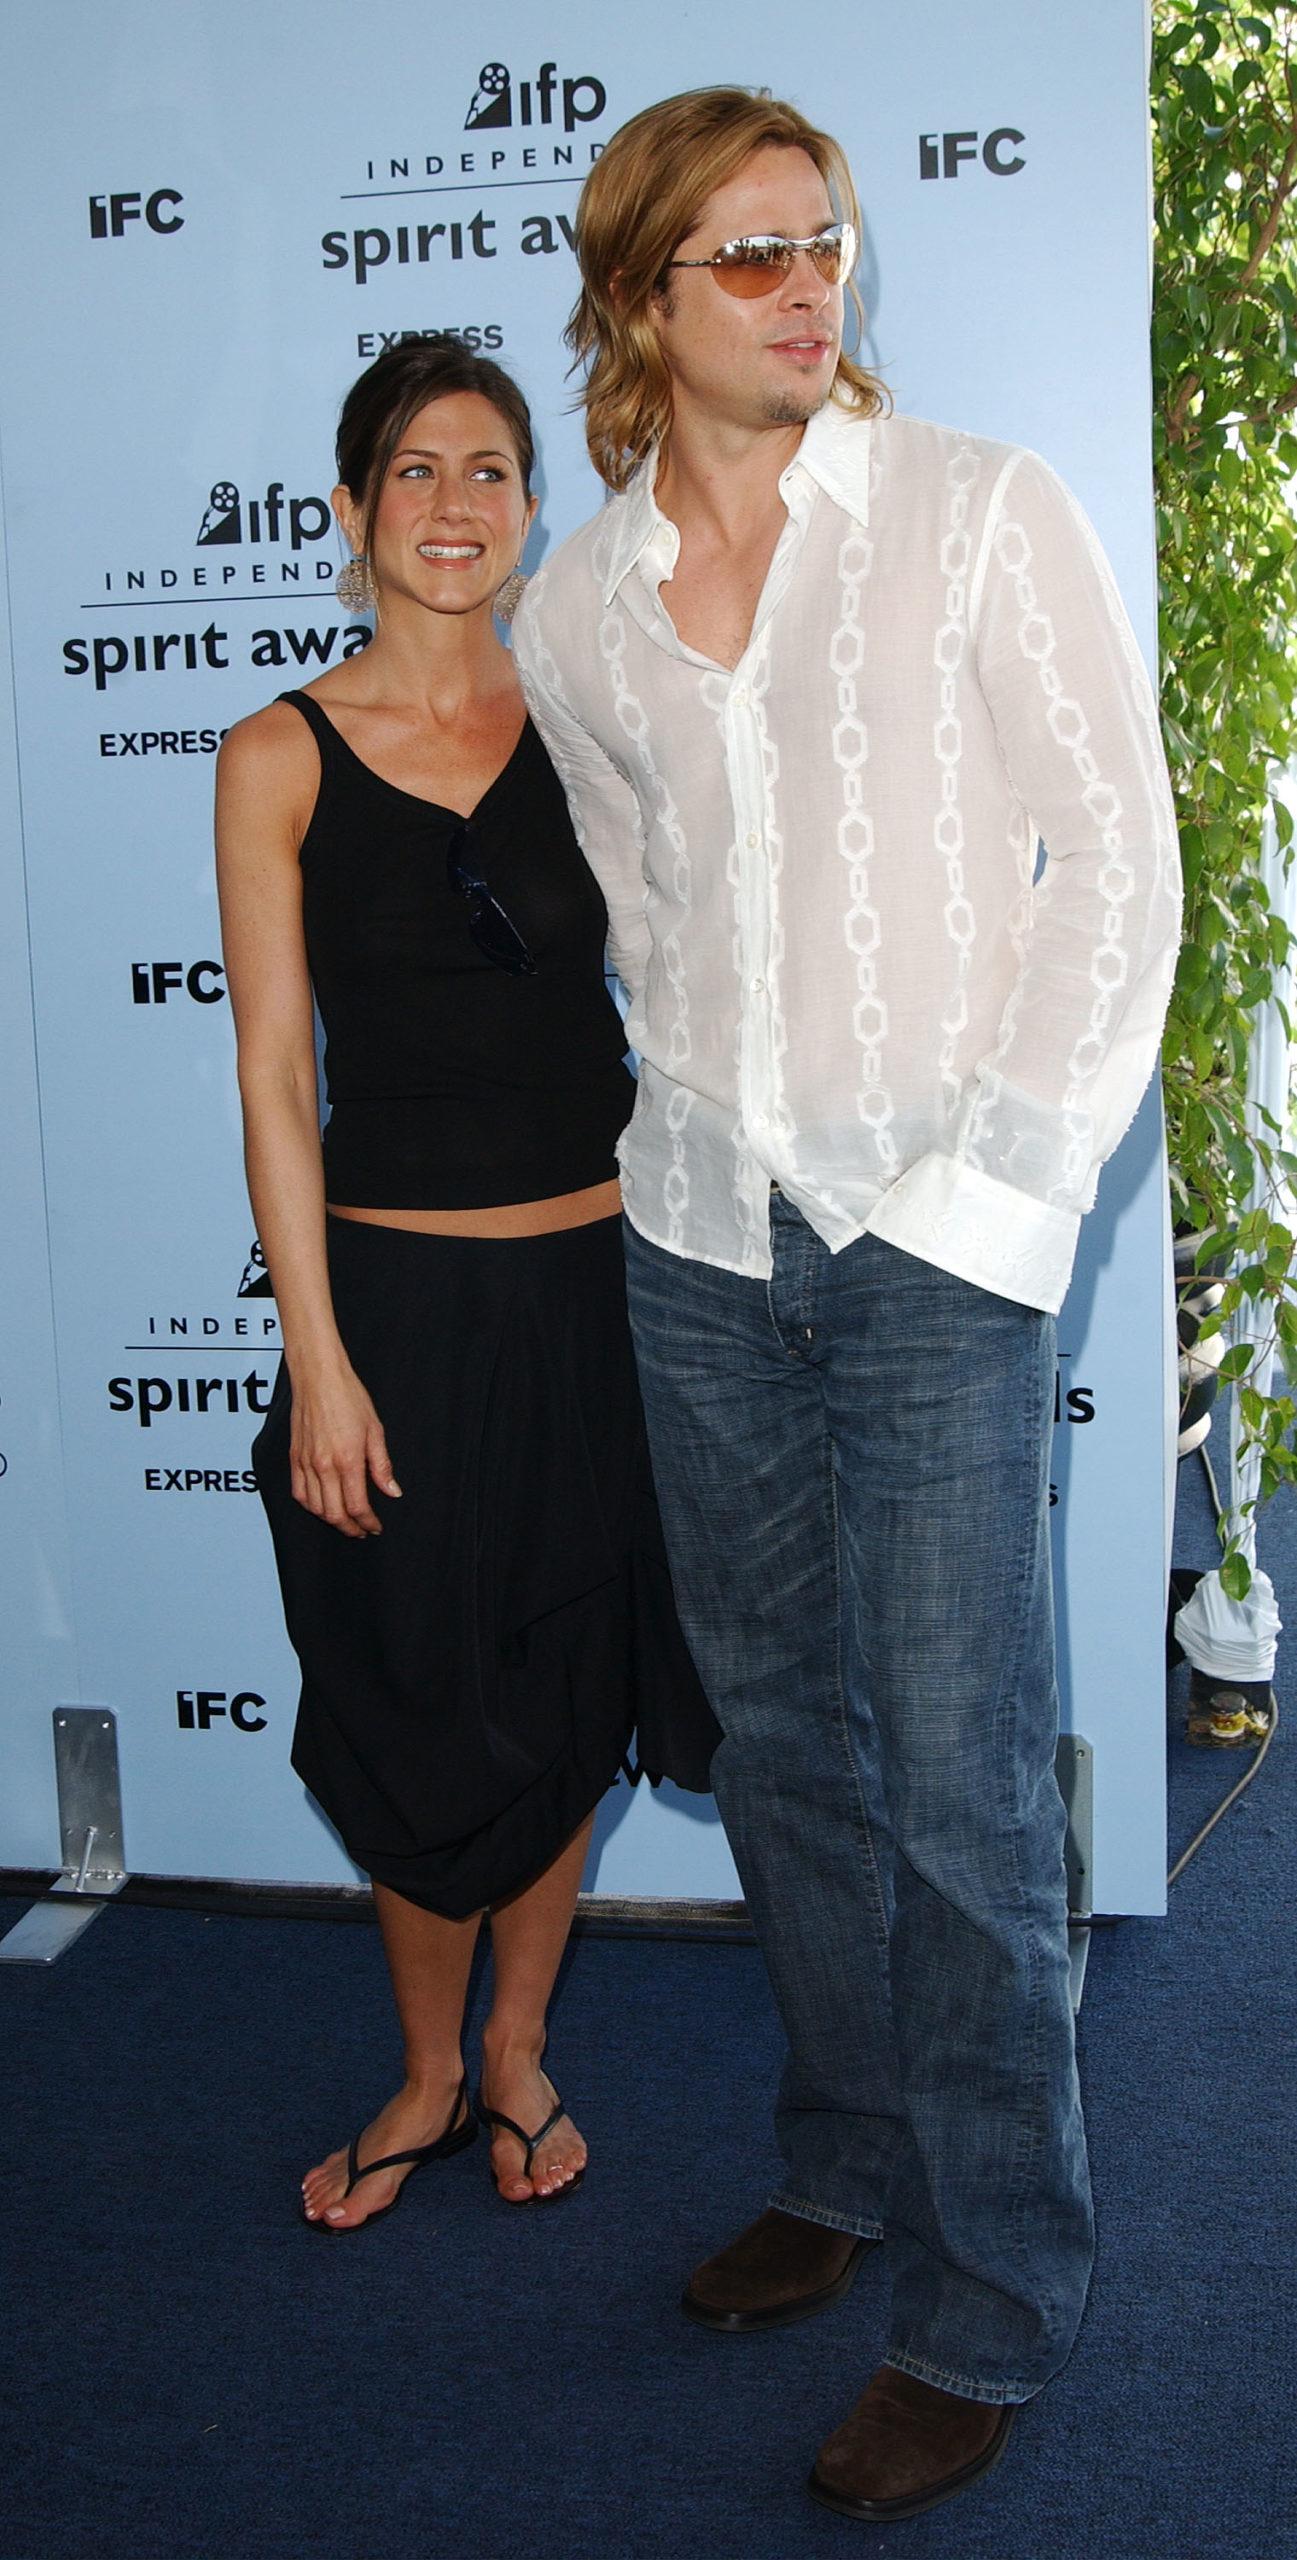 Дженнифер Энистон и Брэд Питт (2003). Фото: Jon Kopaloff/Getty Images